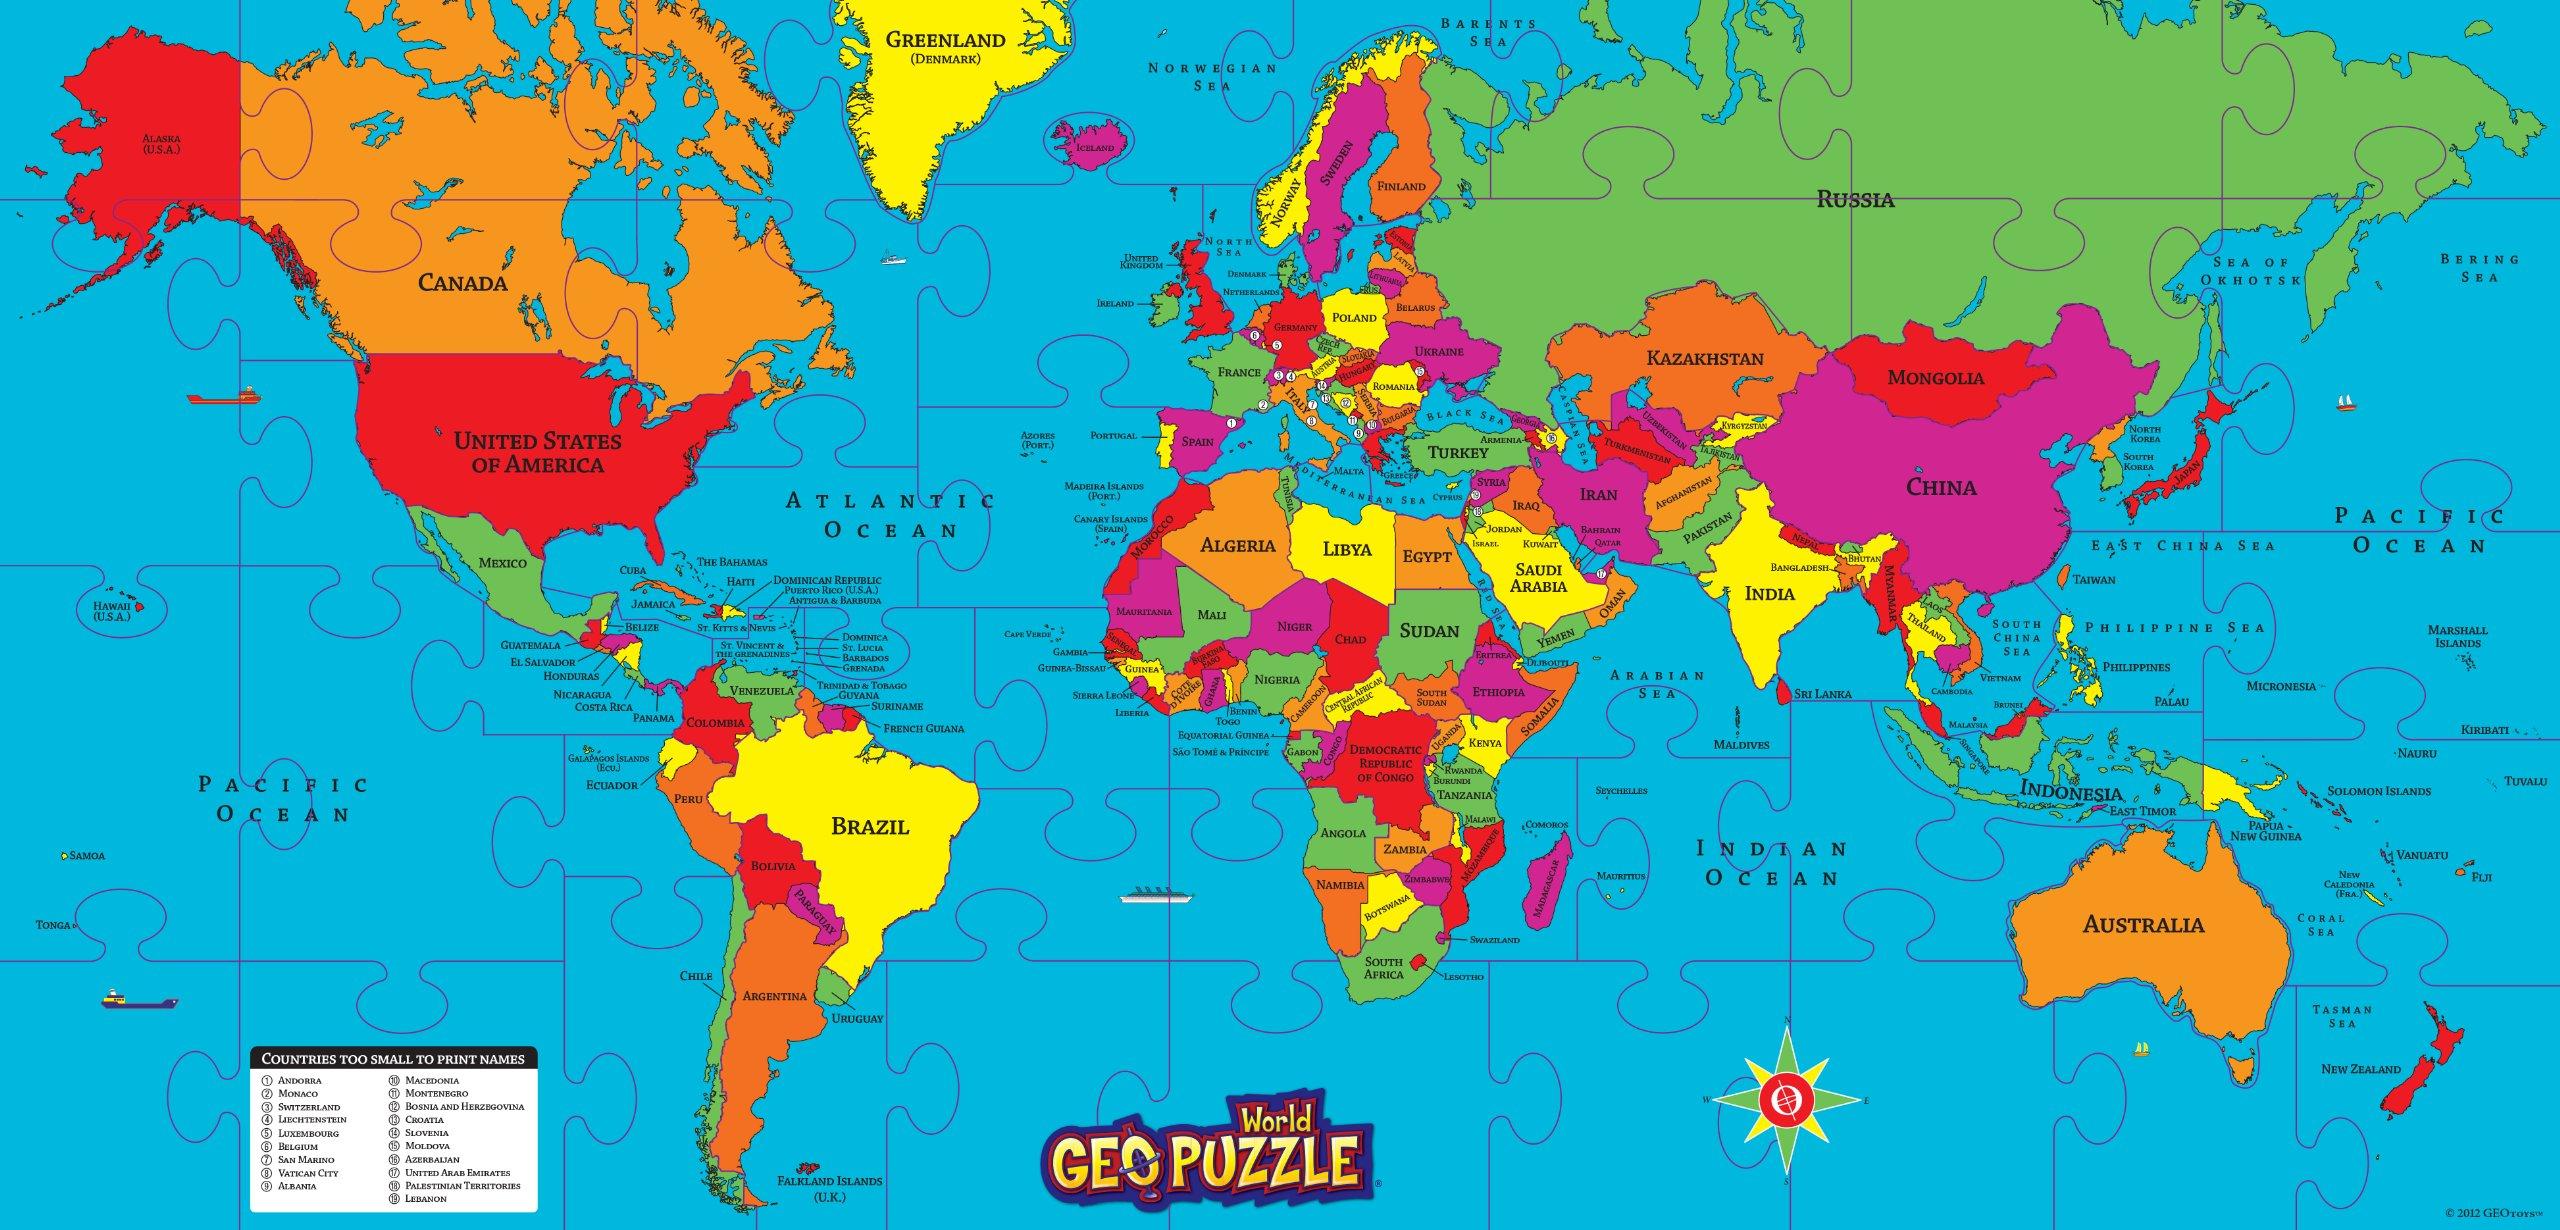 GeoPuzzle World - Educational Geography Jigsaw Puzzle (68 pcs)